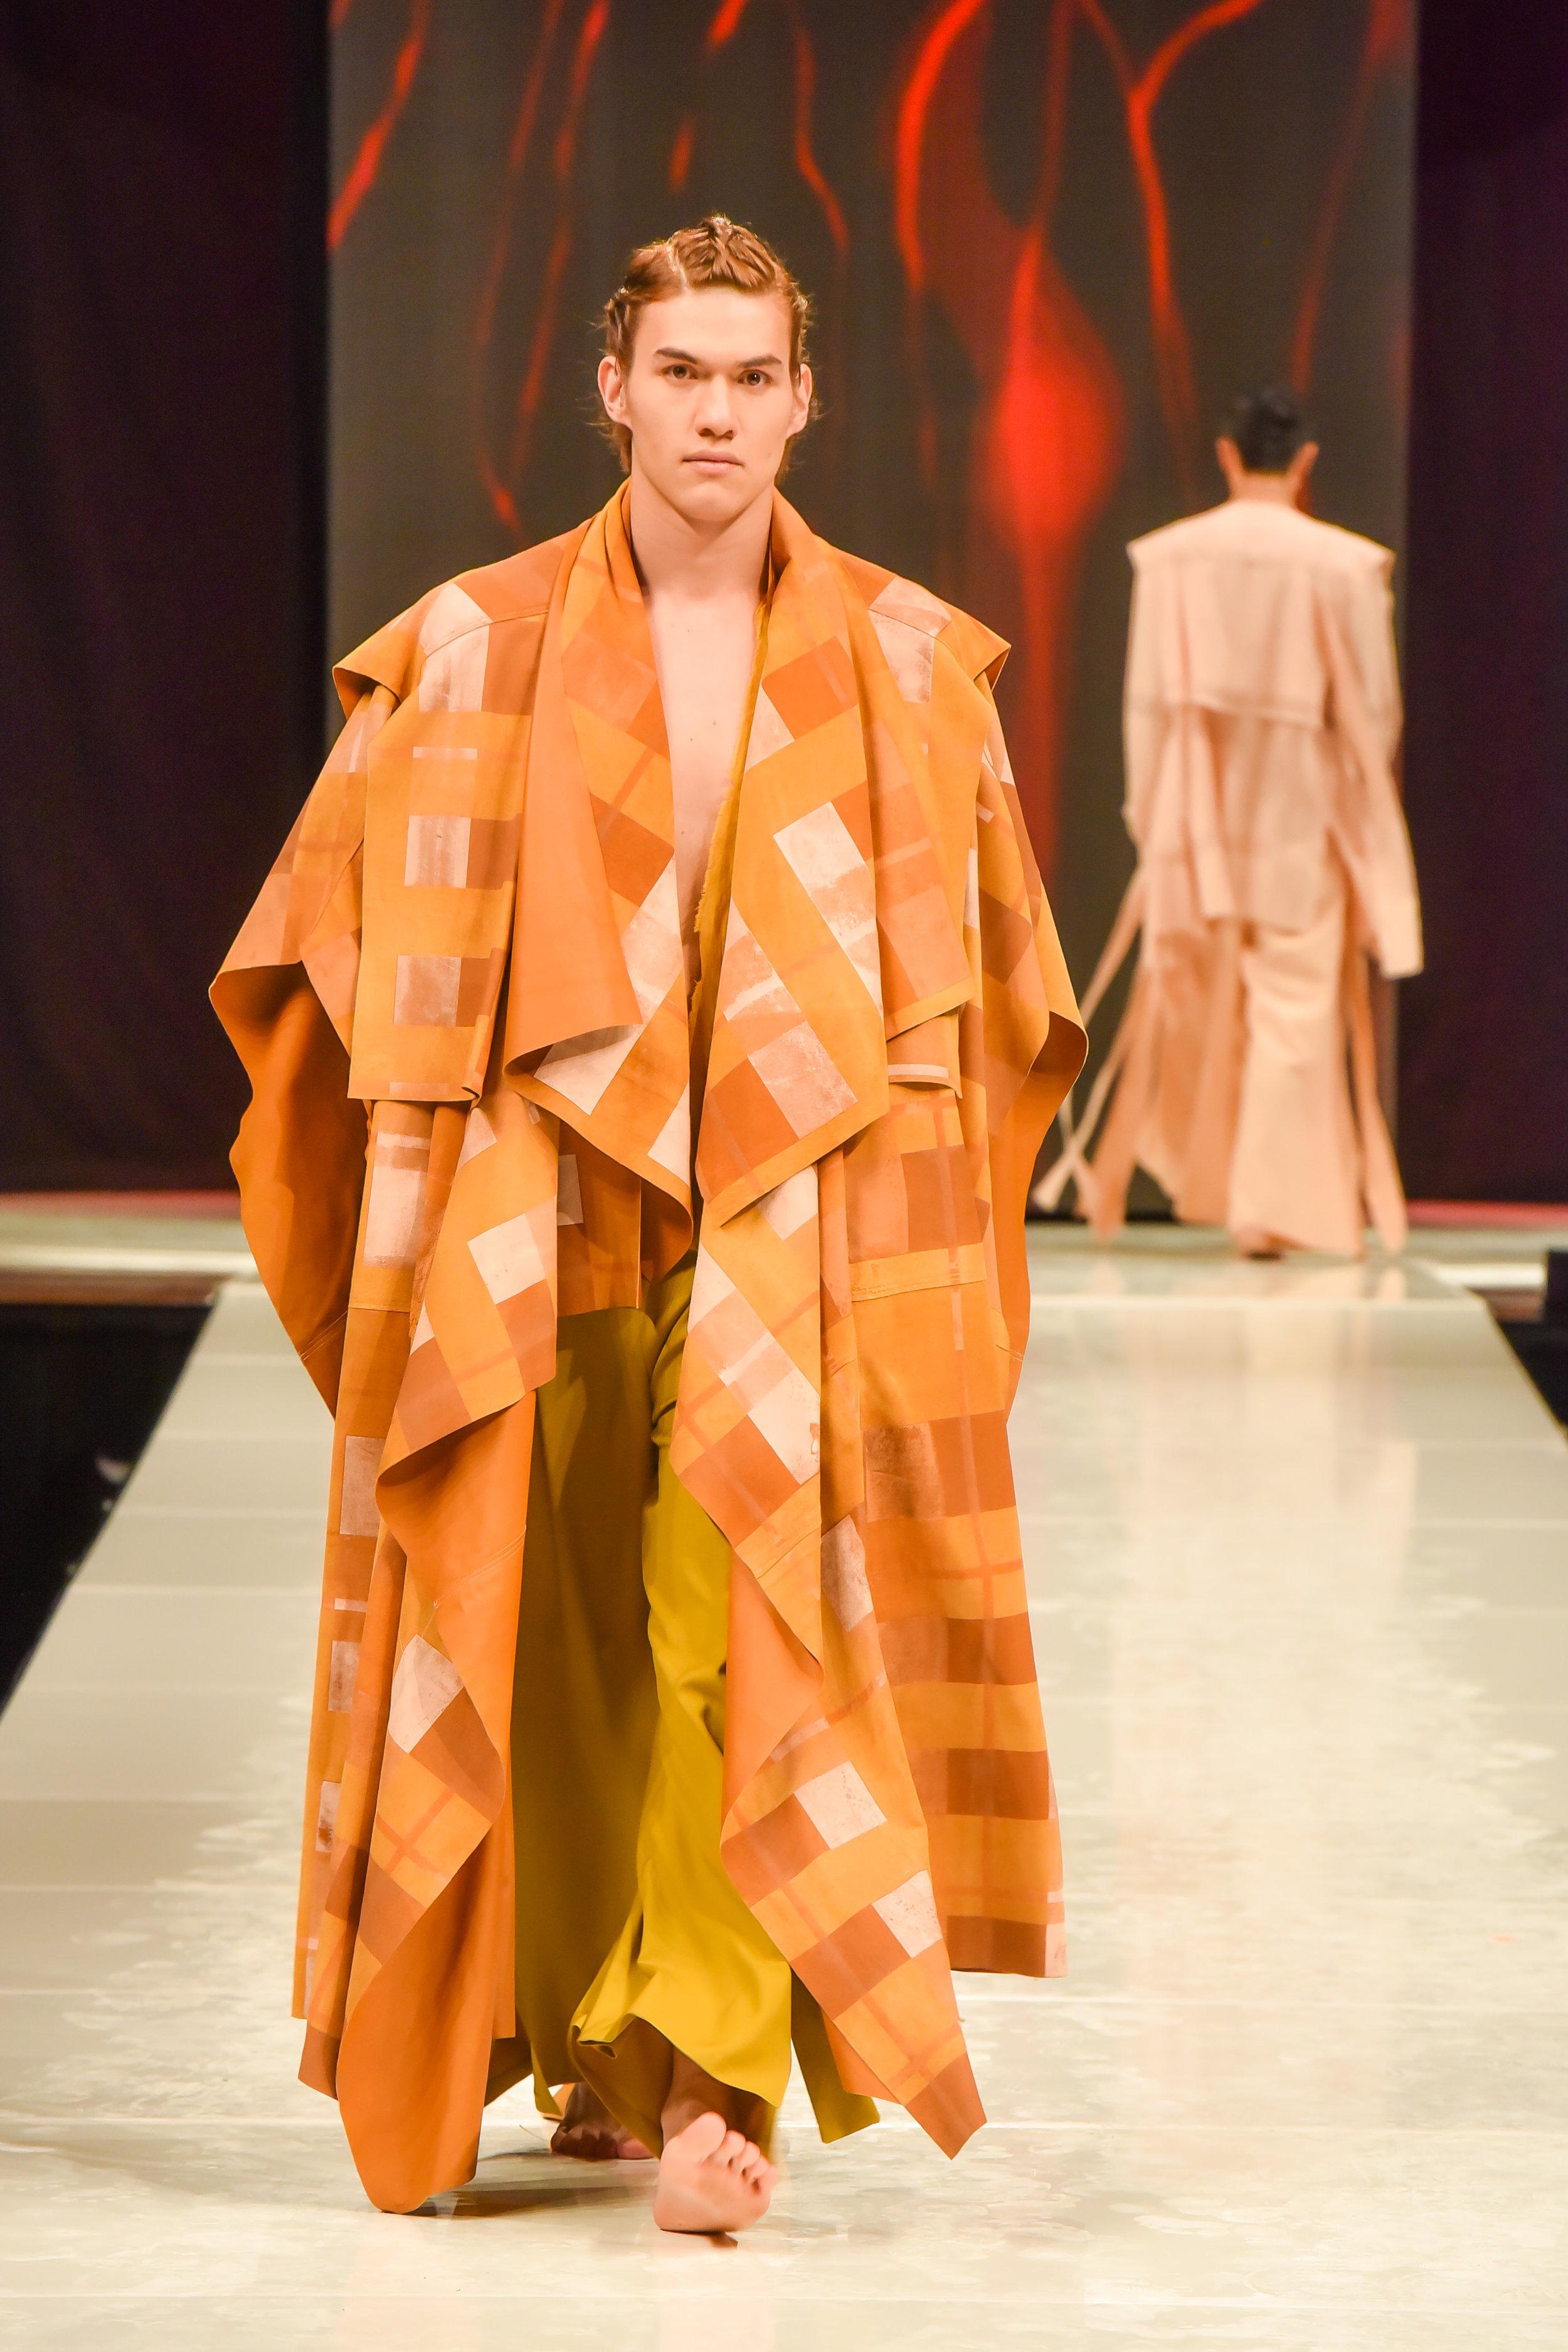 iD2016 - Emerging Designer Awards - Madeleine Hogan_0009.jpg